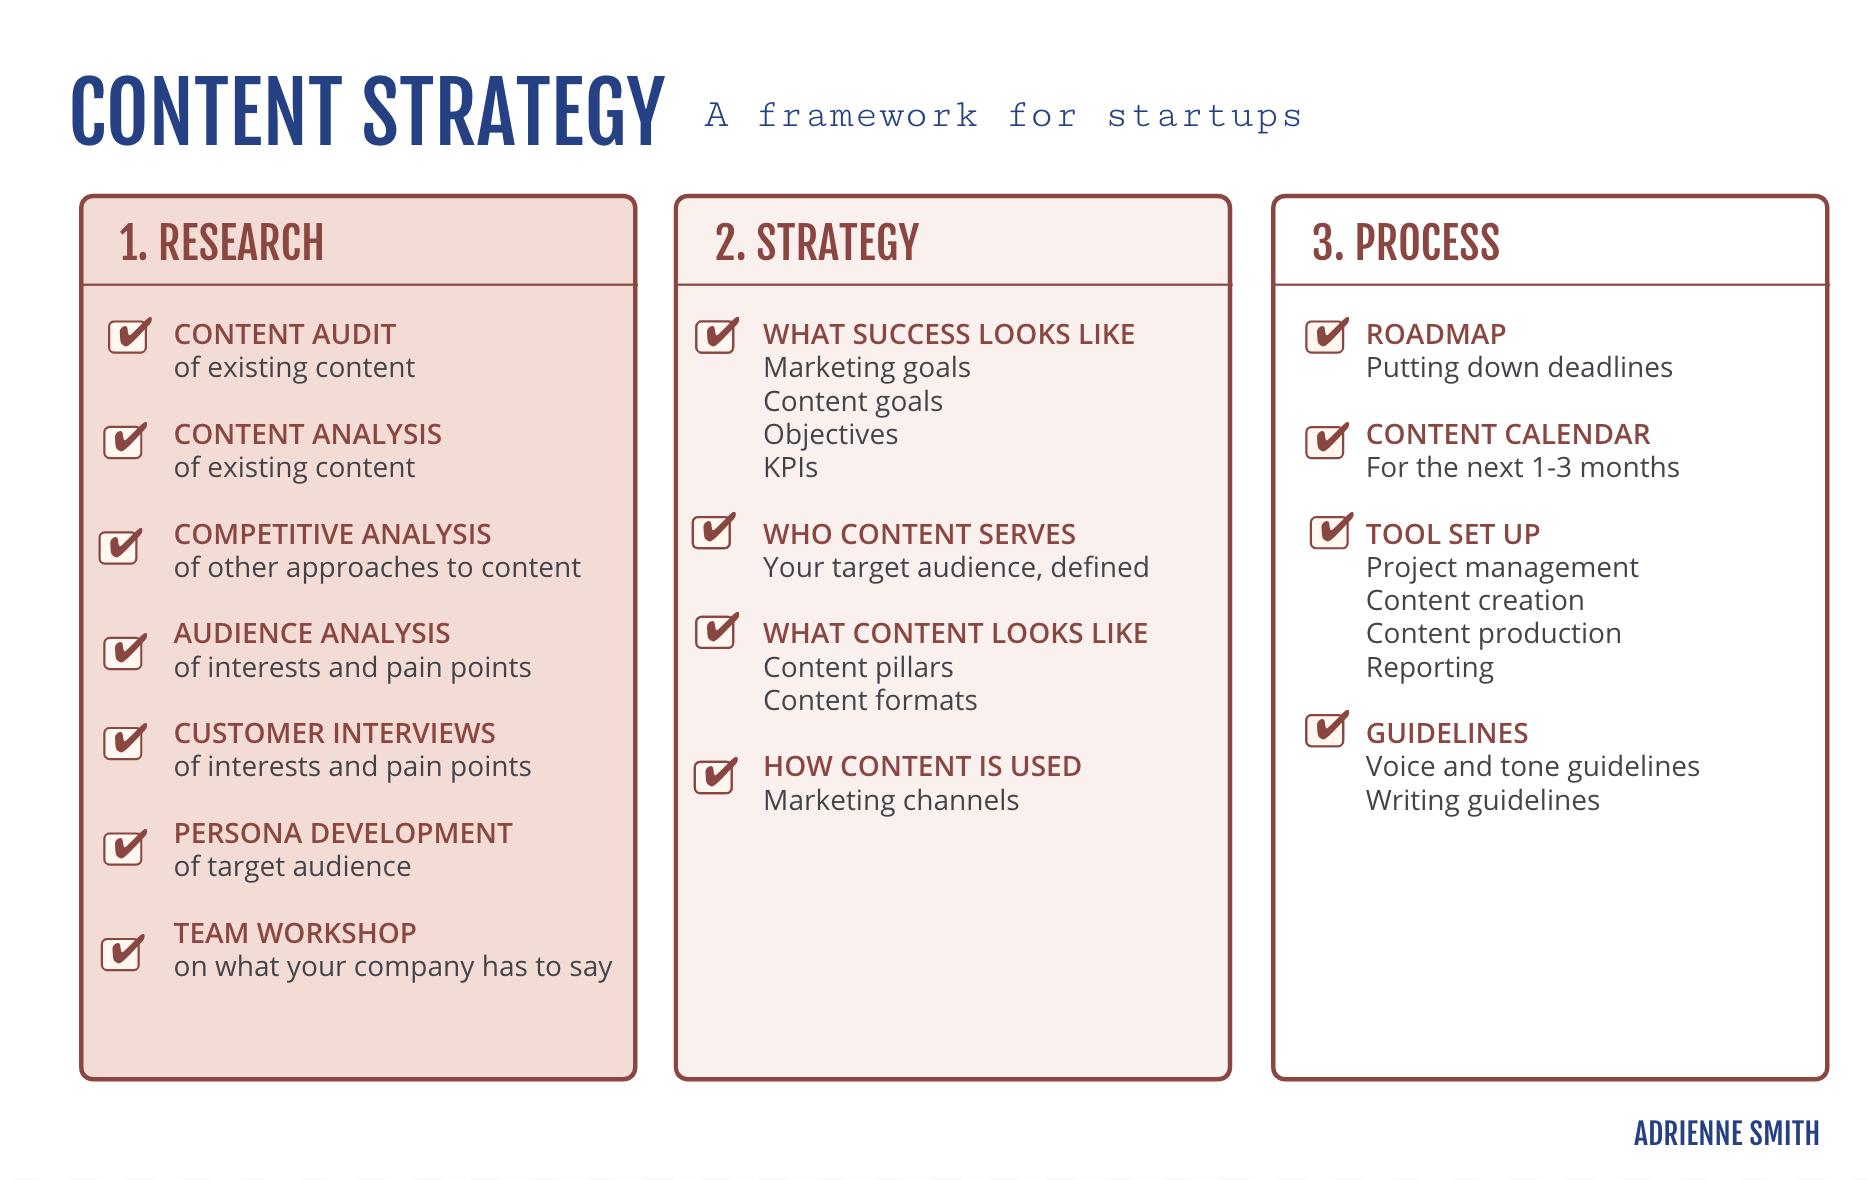 content strategy framework for startups - adrienne smith's framework